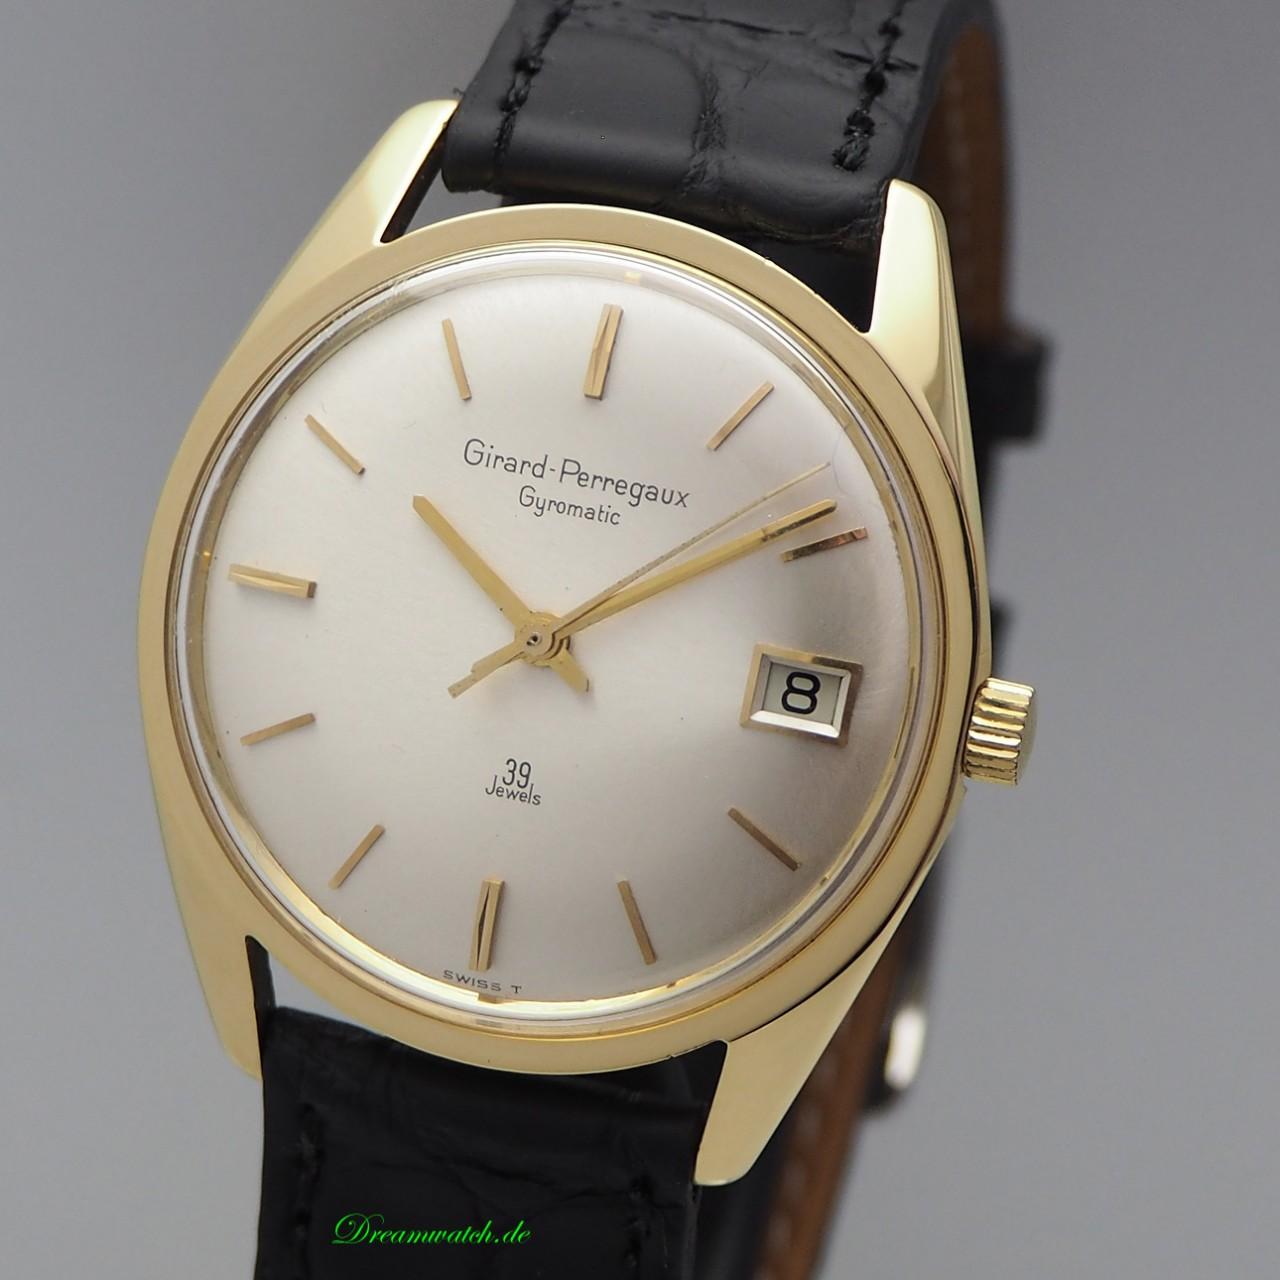 Girard Perregaux Gyromatic Automatik 39 jewels, Gold 18k/750